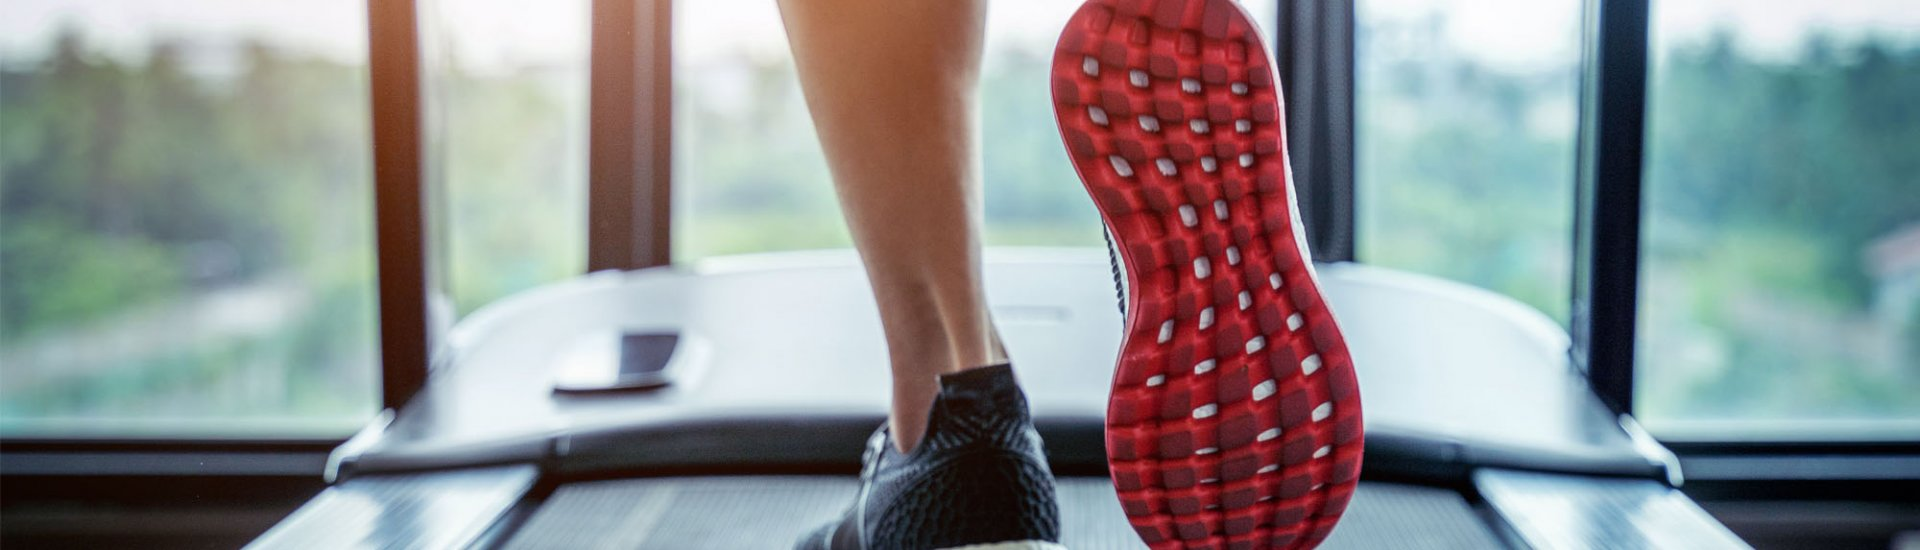 Christopeit Laufband: Top 3 Modelle, Laufbandtraining optimieren